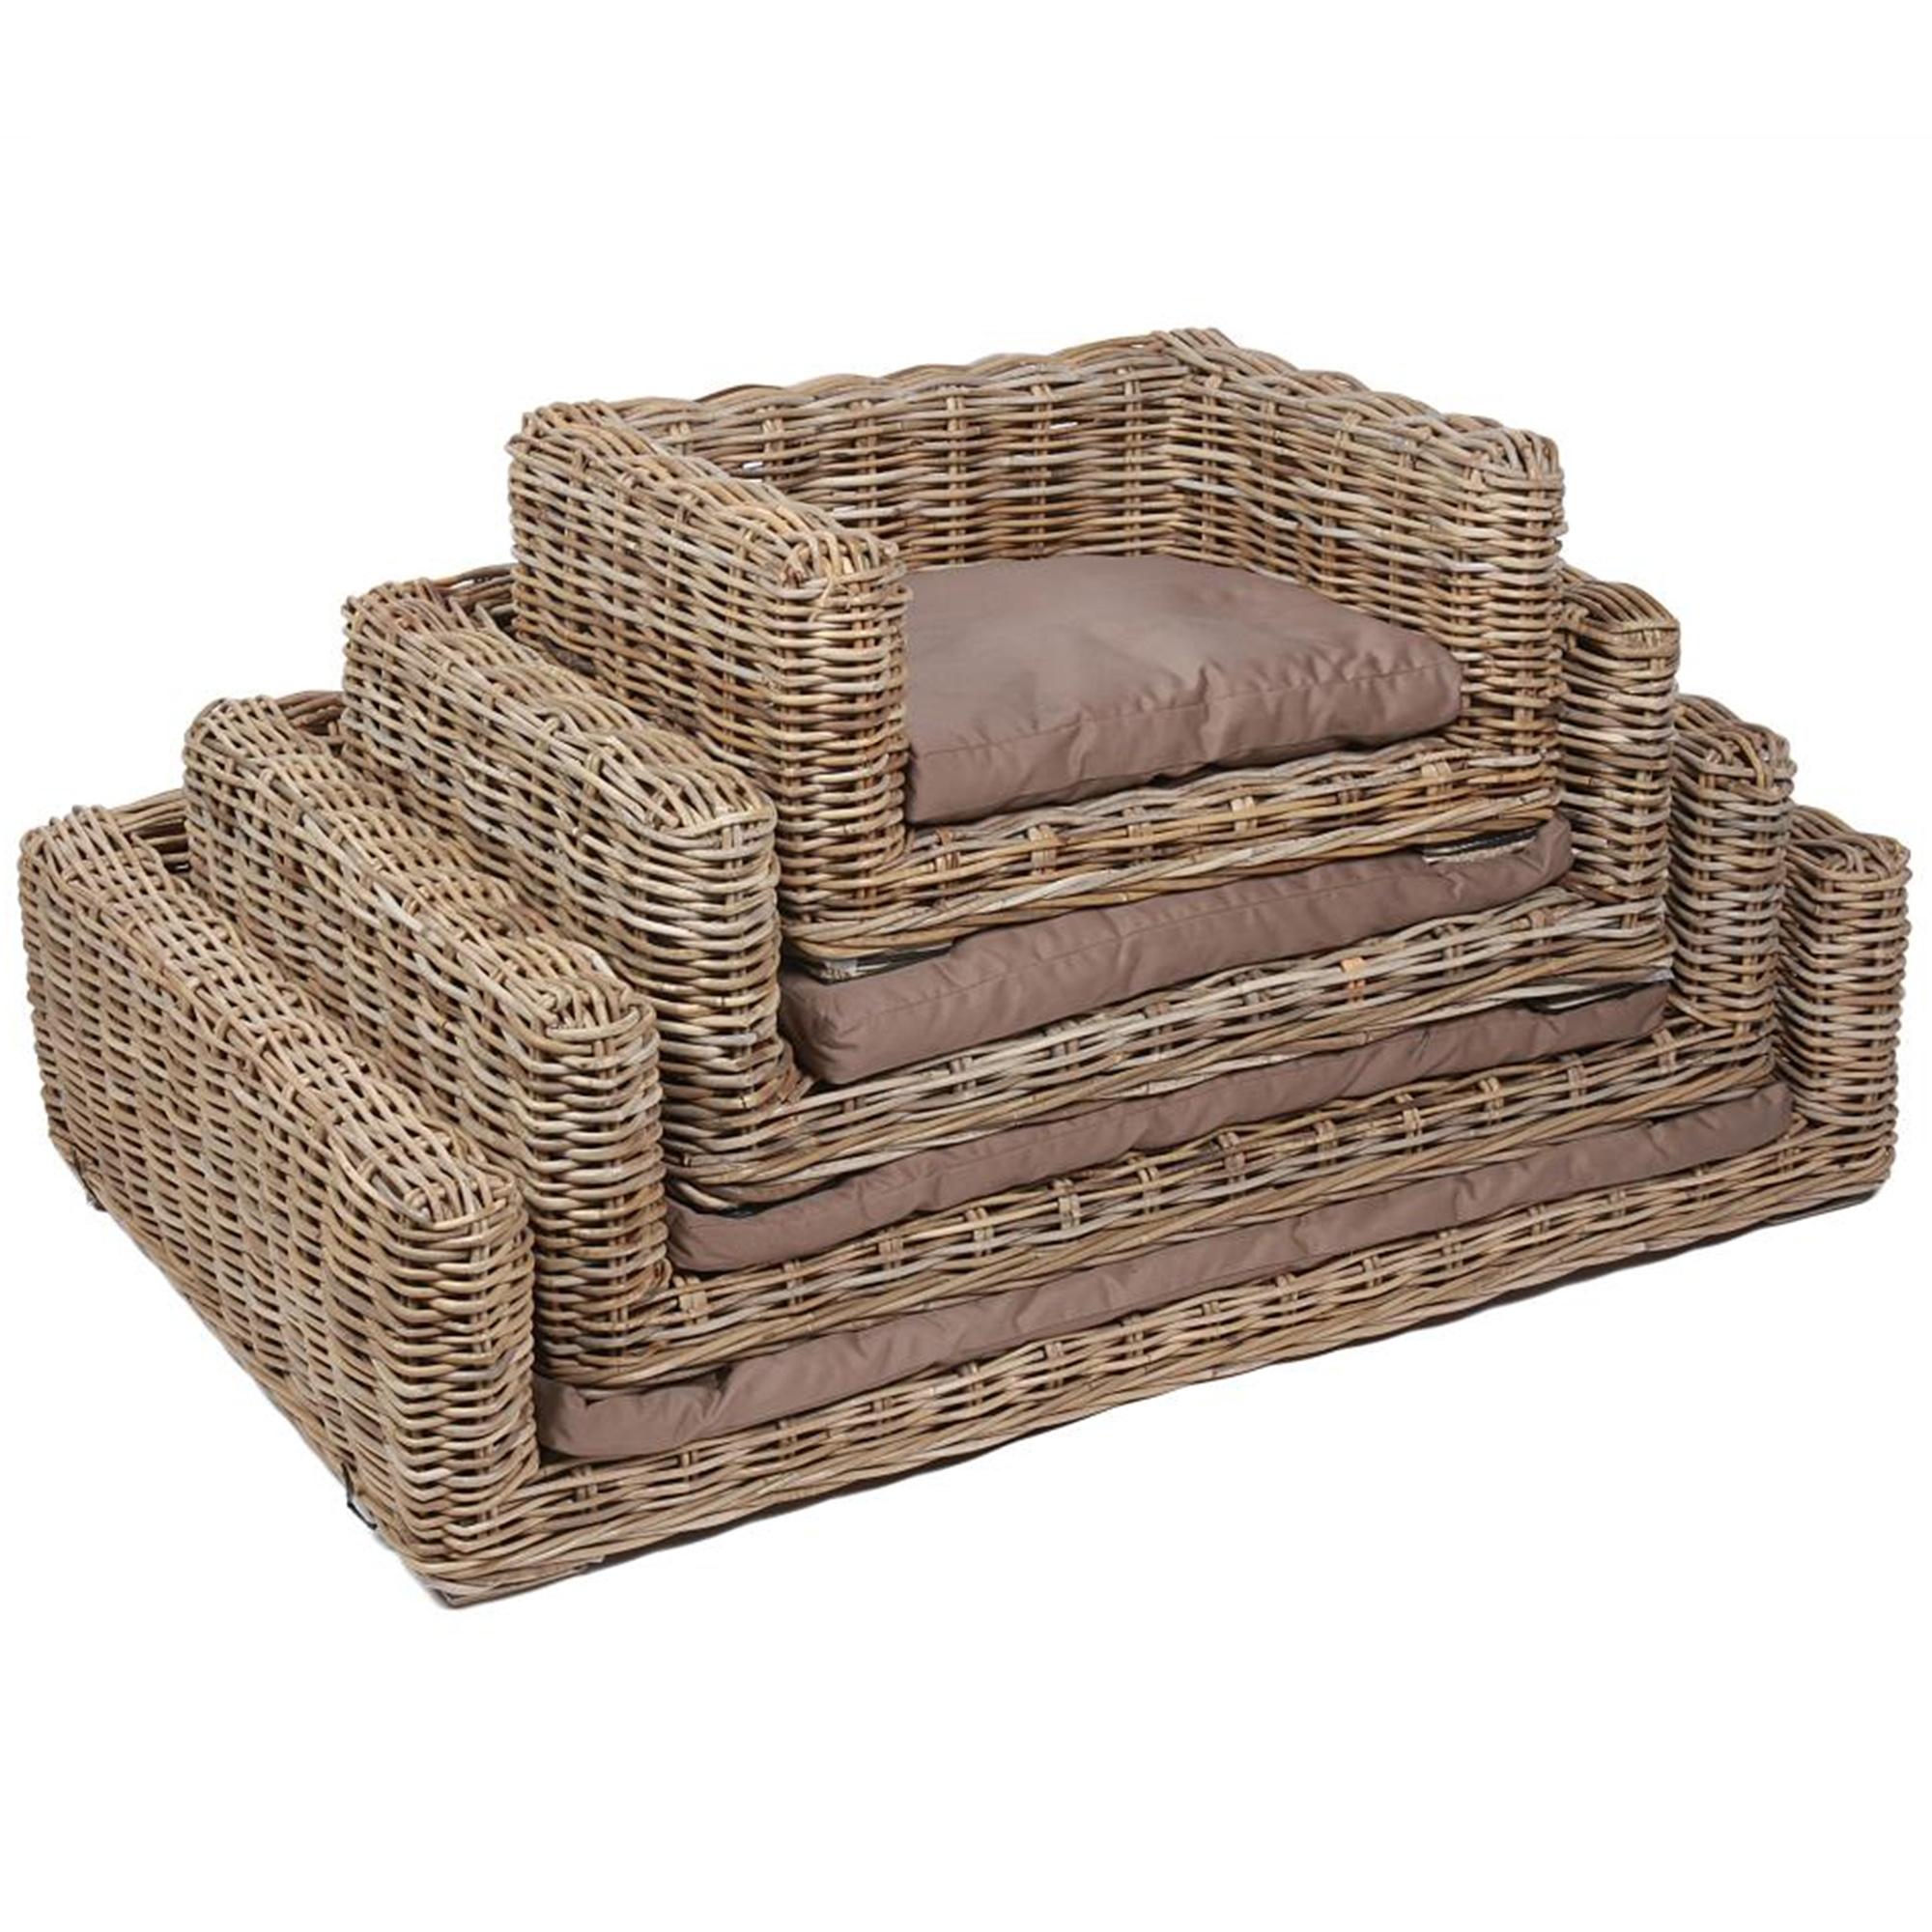 Kooboo Wicker Chair: Wicker Merchant Set Of 4 Rectangular Dog Baskets